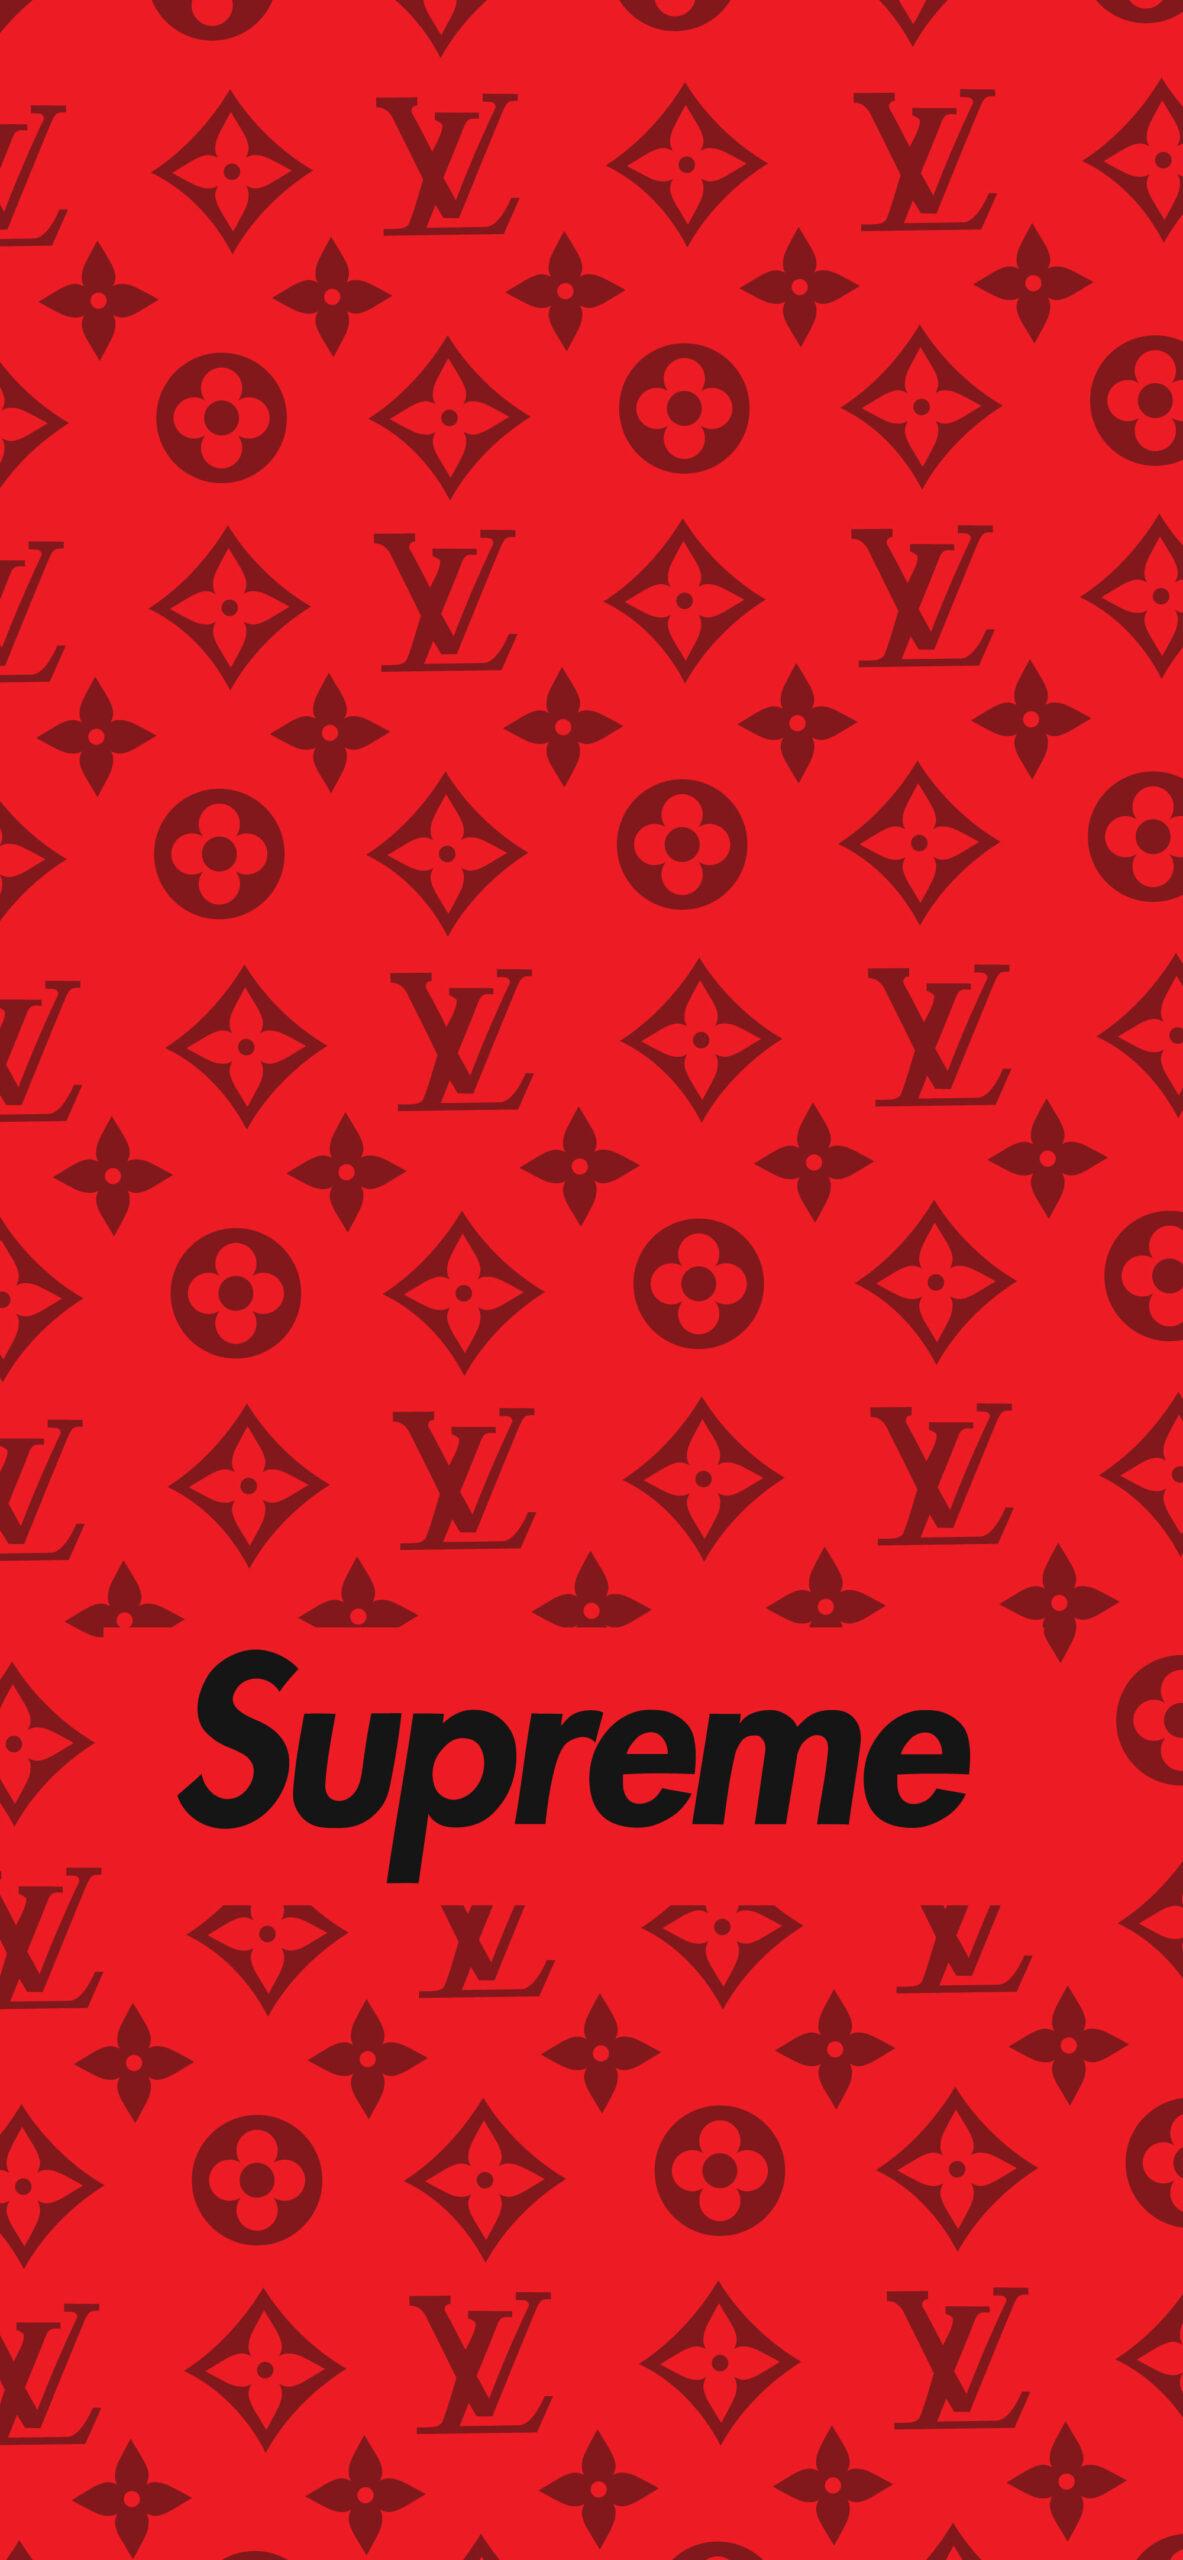 supreme louis vuitton red wallpaper 2